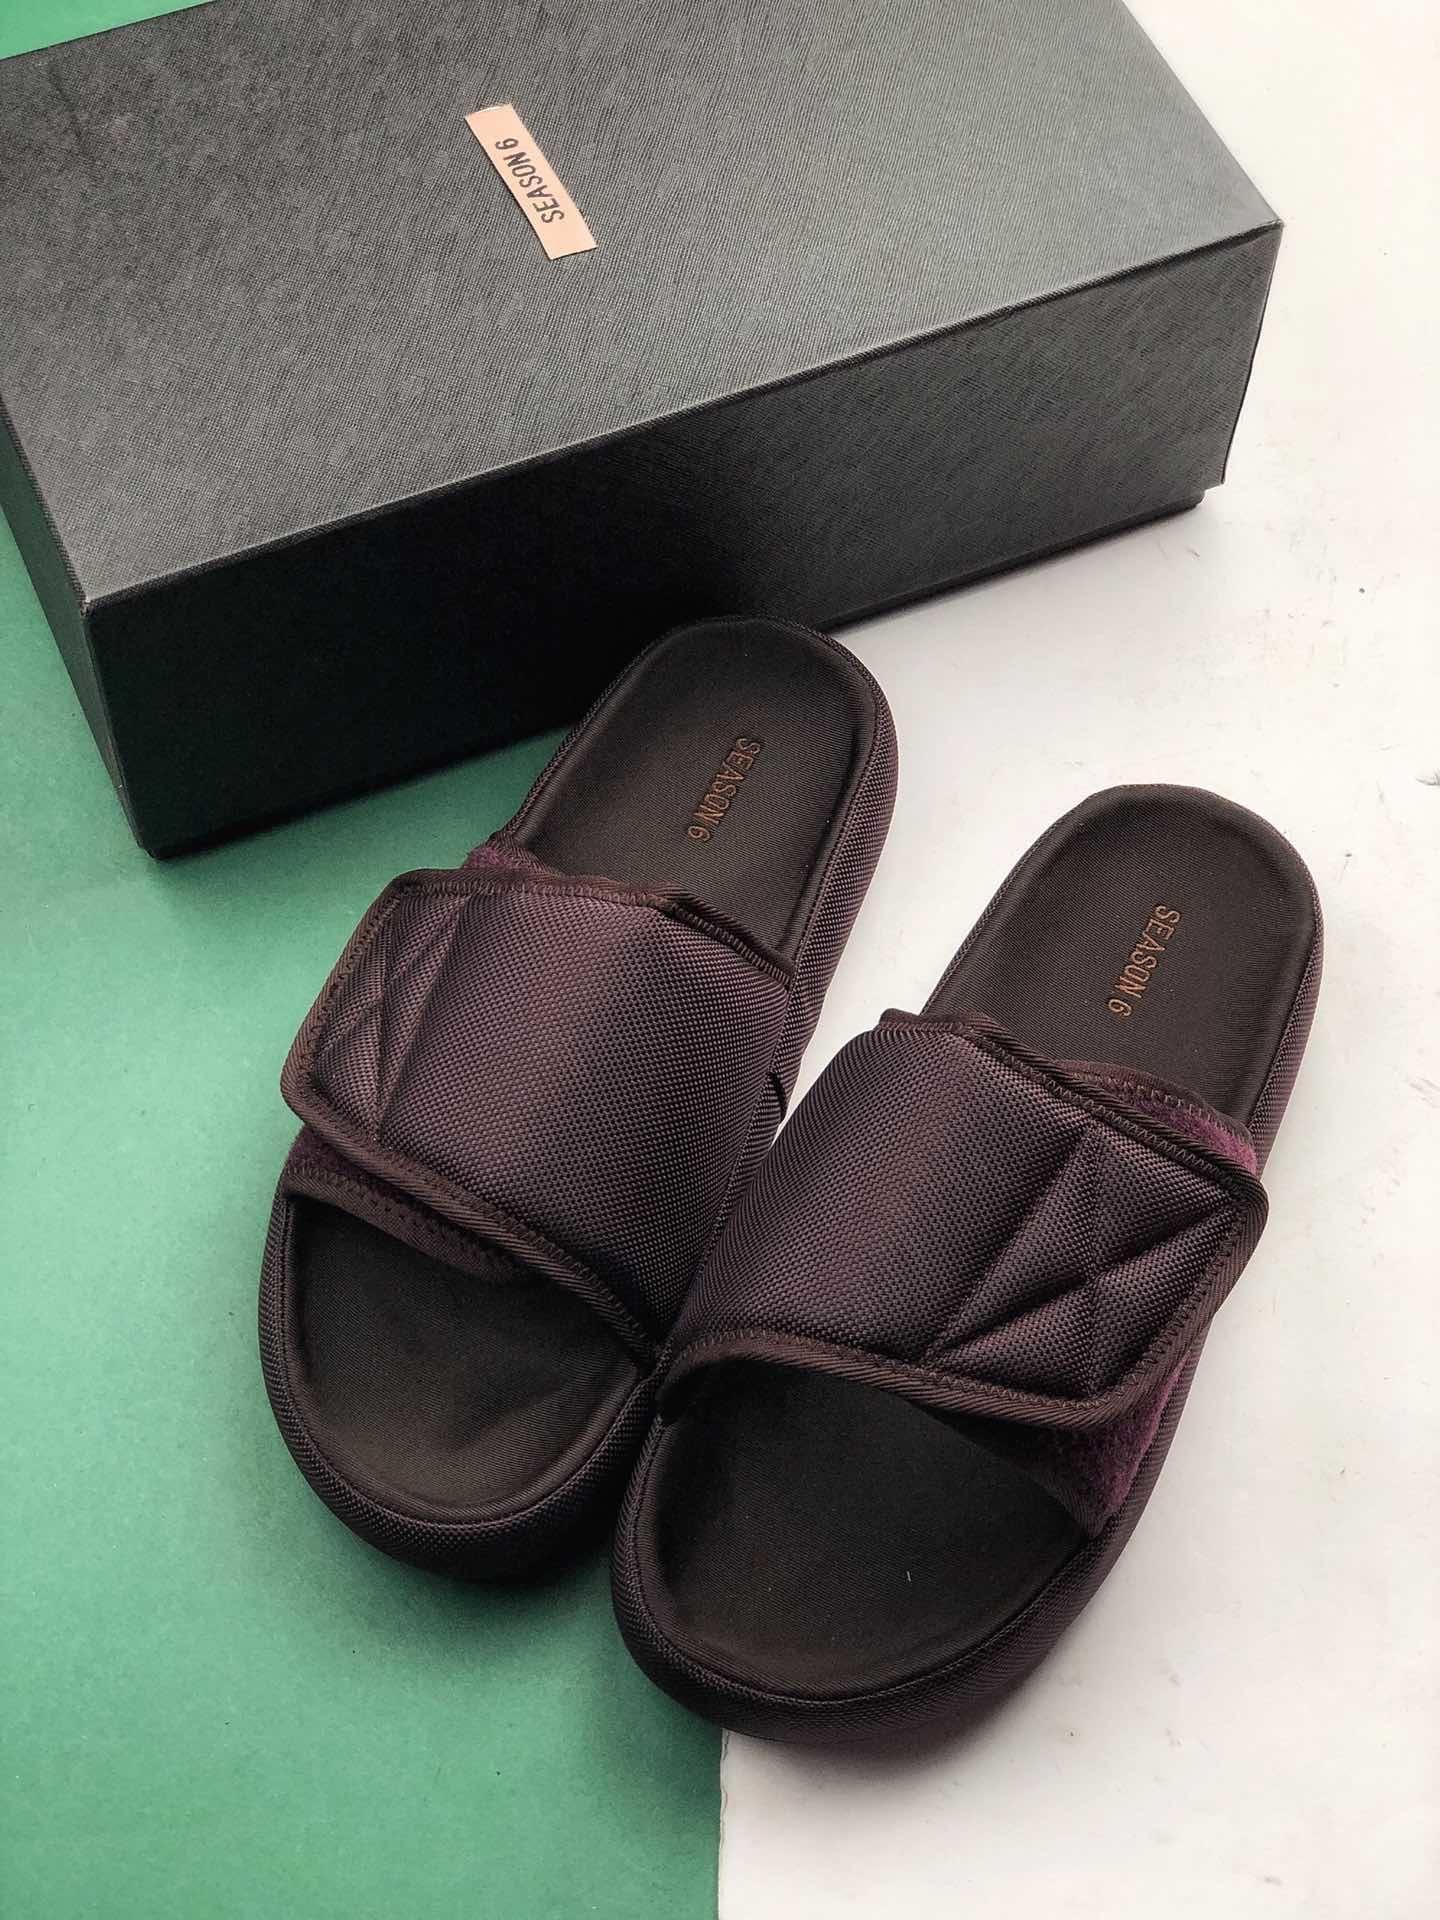 Kanye West Yeezy Season 6 Slides Girls Boots Gold Shoes Designer Slippers